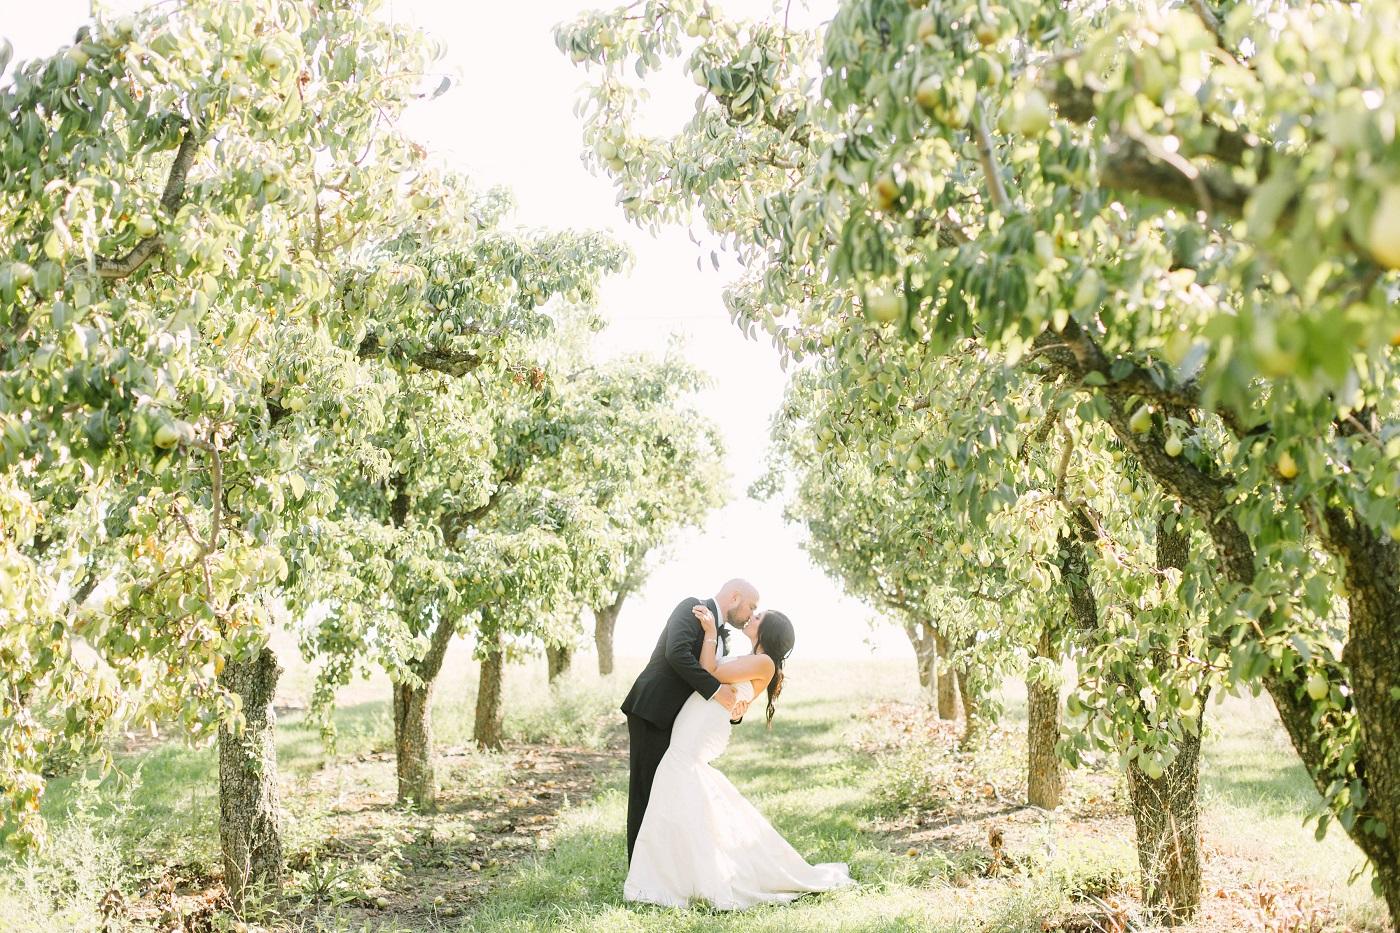 liuna-gardens-wedding-hamilton-kj-and-co-12.JPG